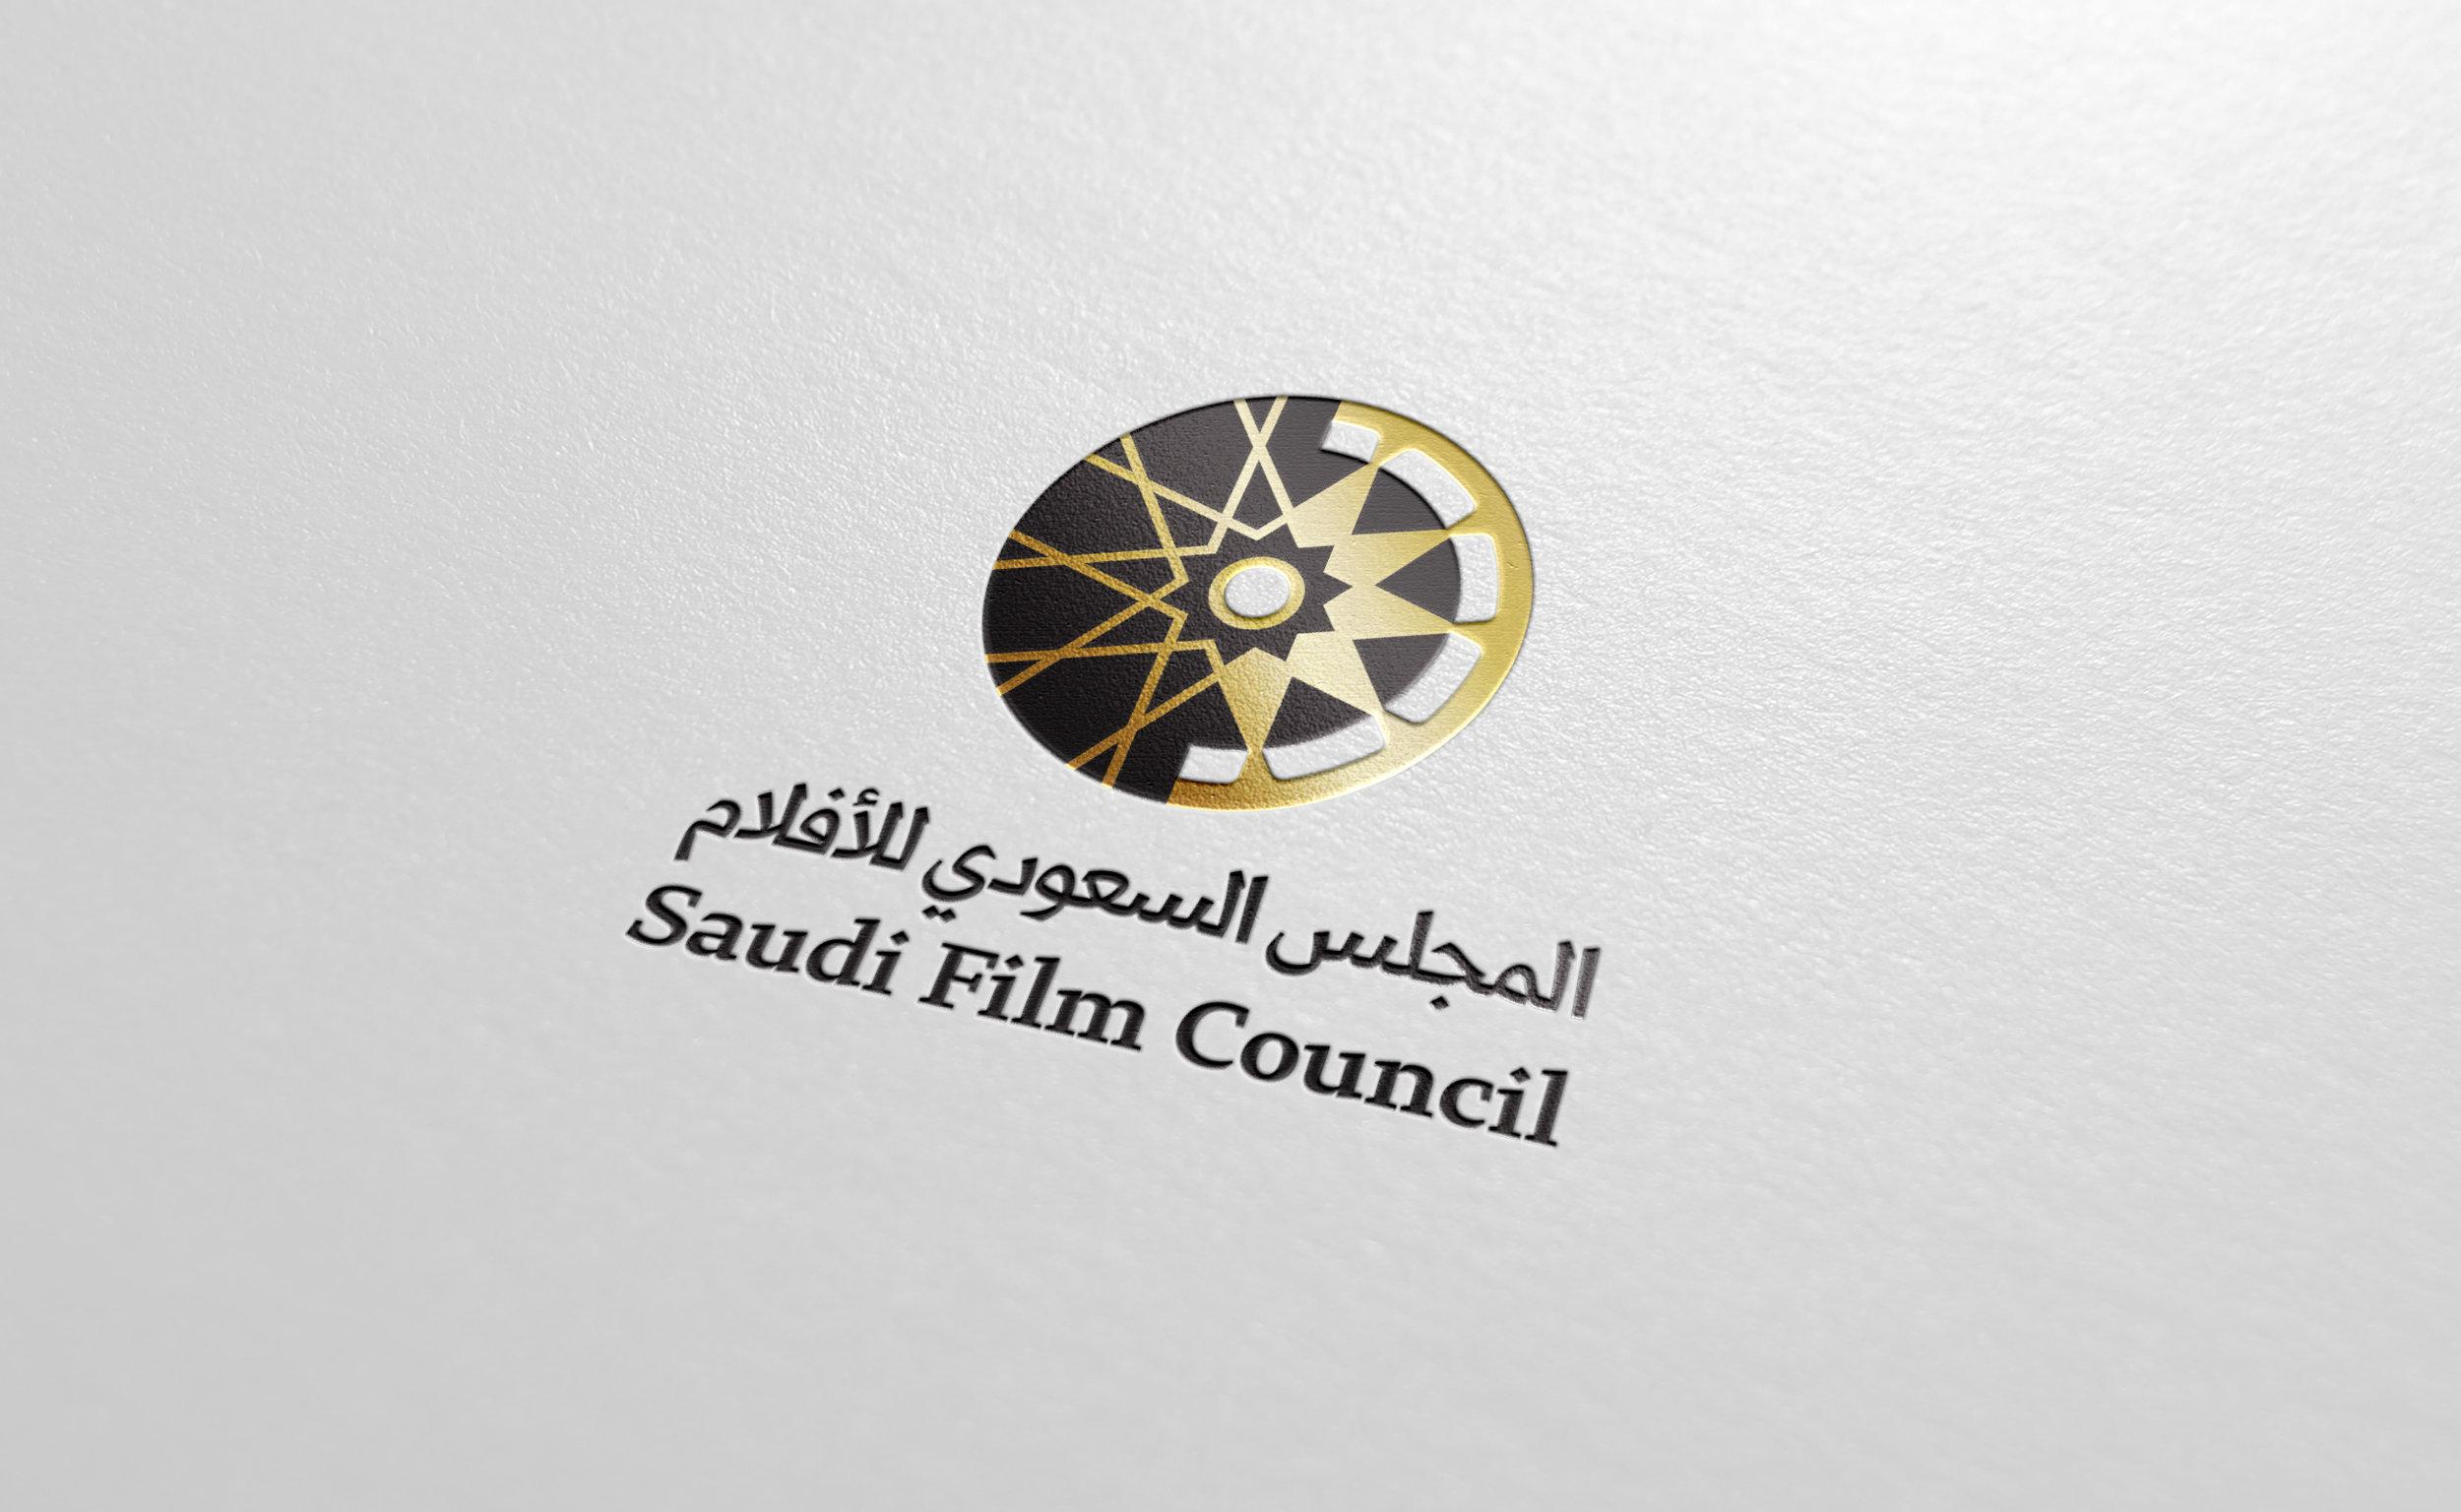 Kalian_Branding_Saudi_Film_Council_Logo.jpg